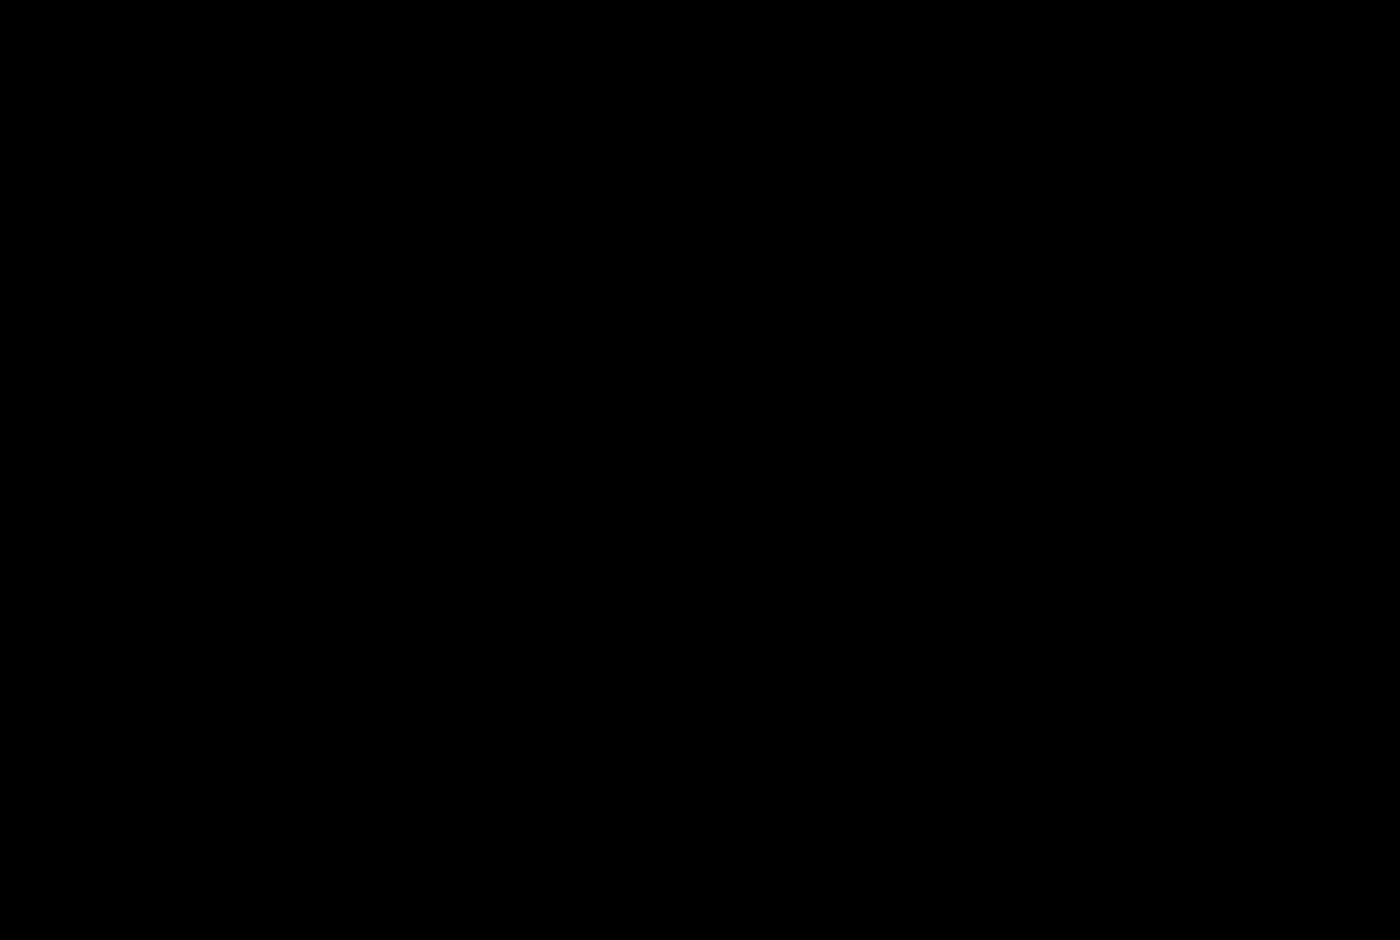 Pixilart Lamborghini Sketch By Phoenix101